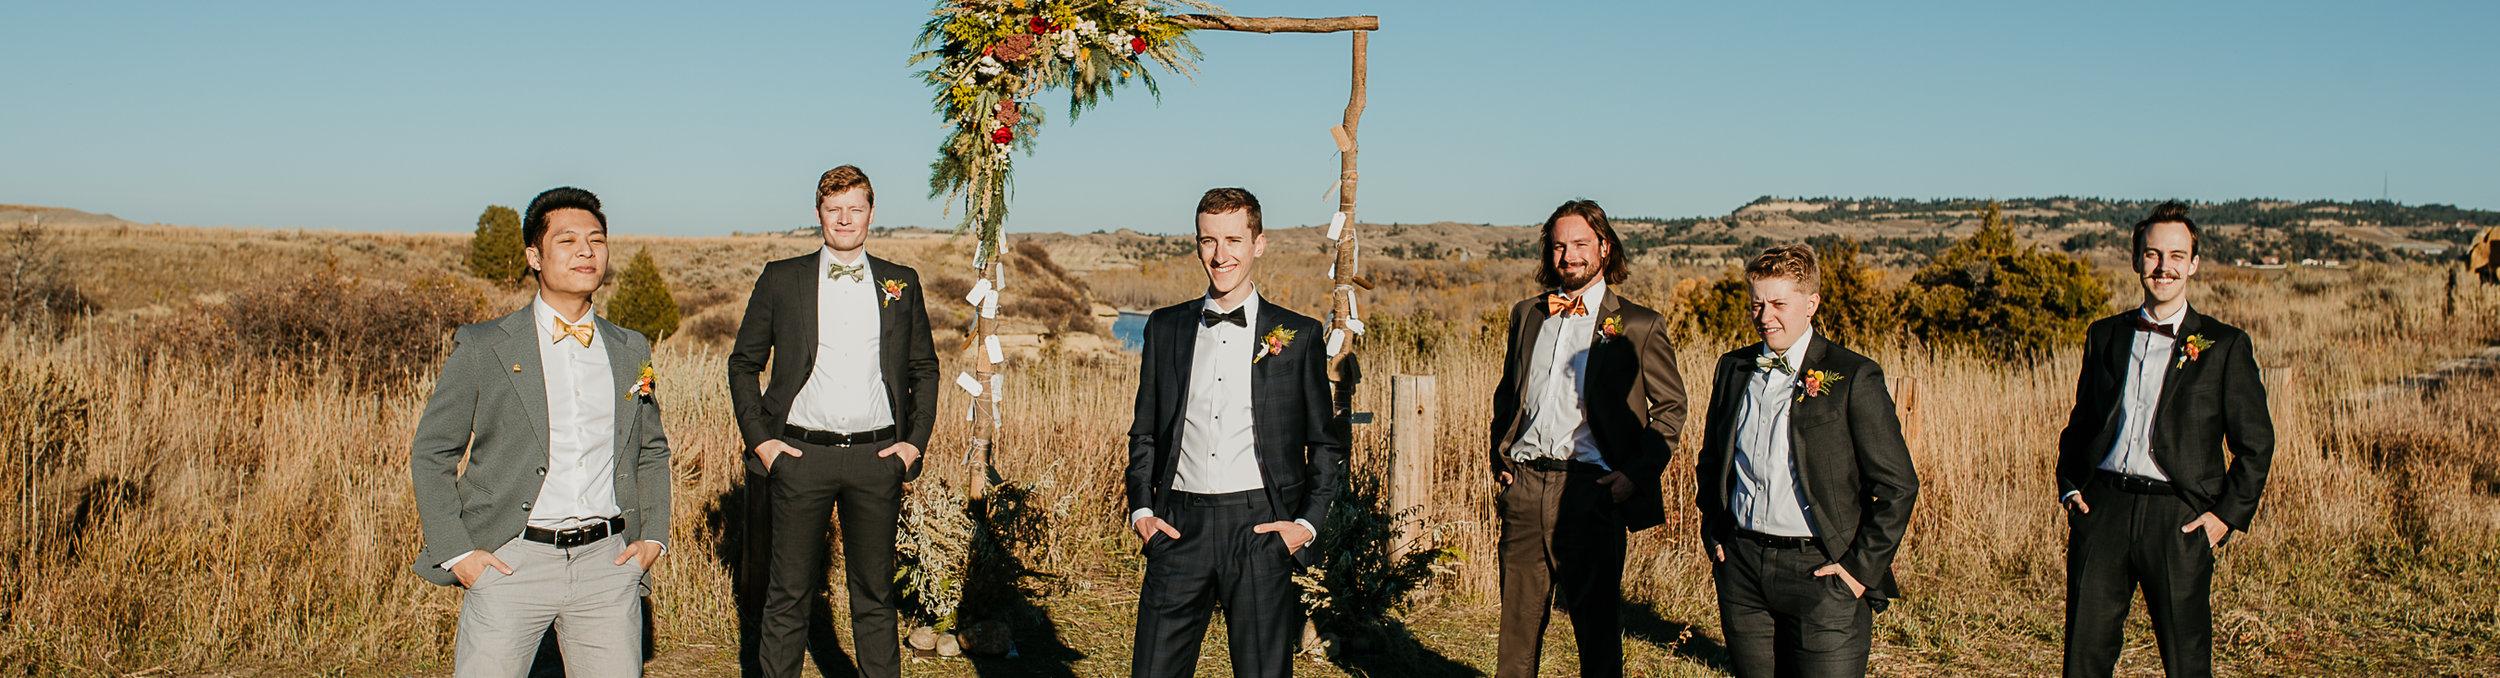 0797Fall Wedding_Maroon Wedding_Billings Wedding Photographer_Emma + Dan_October 20, 2018-4014.jpg